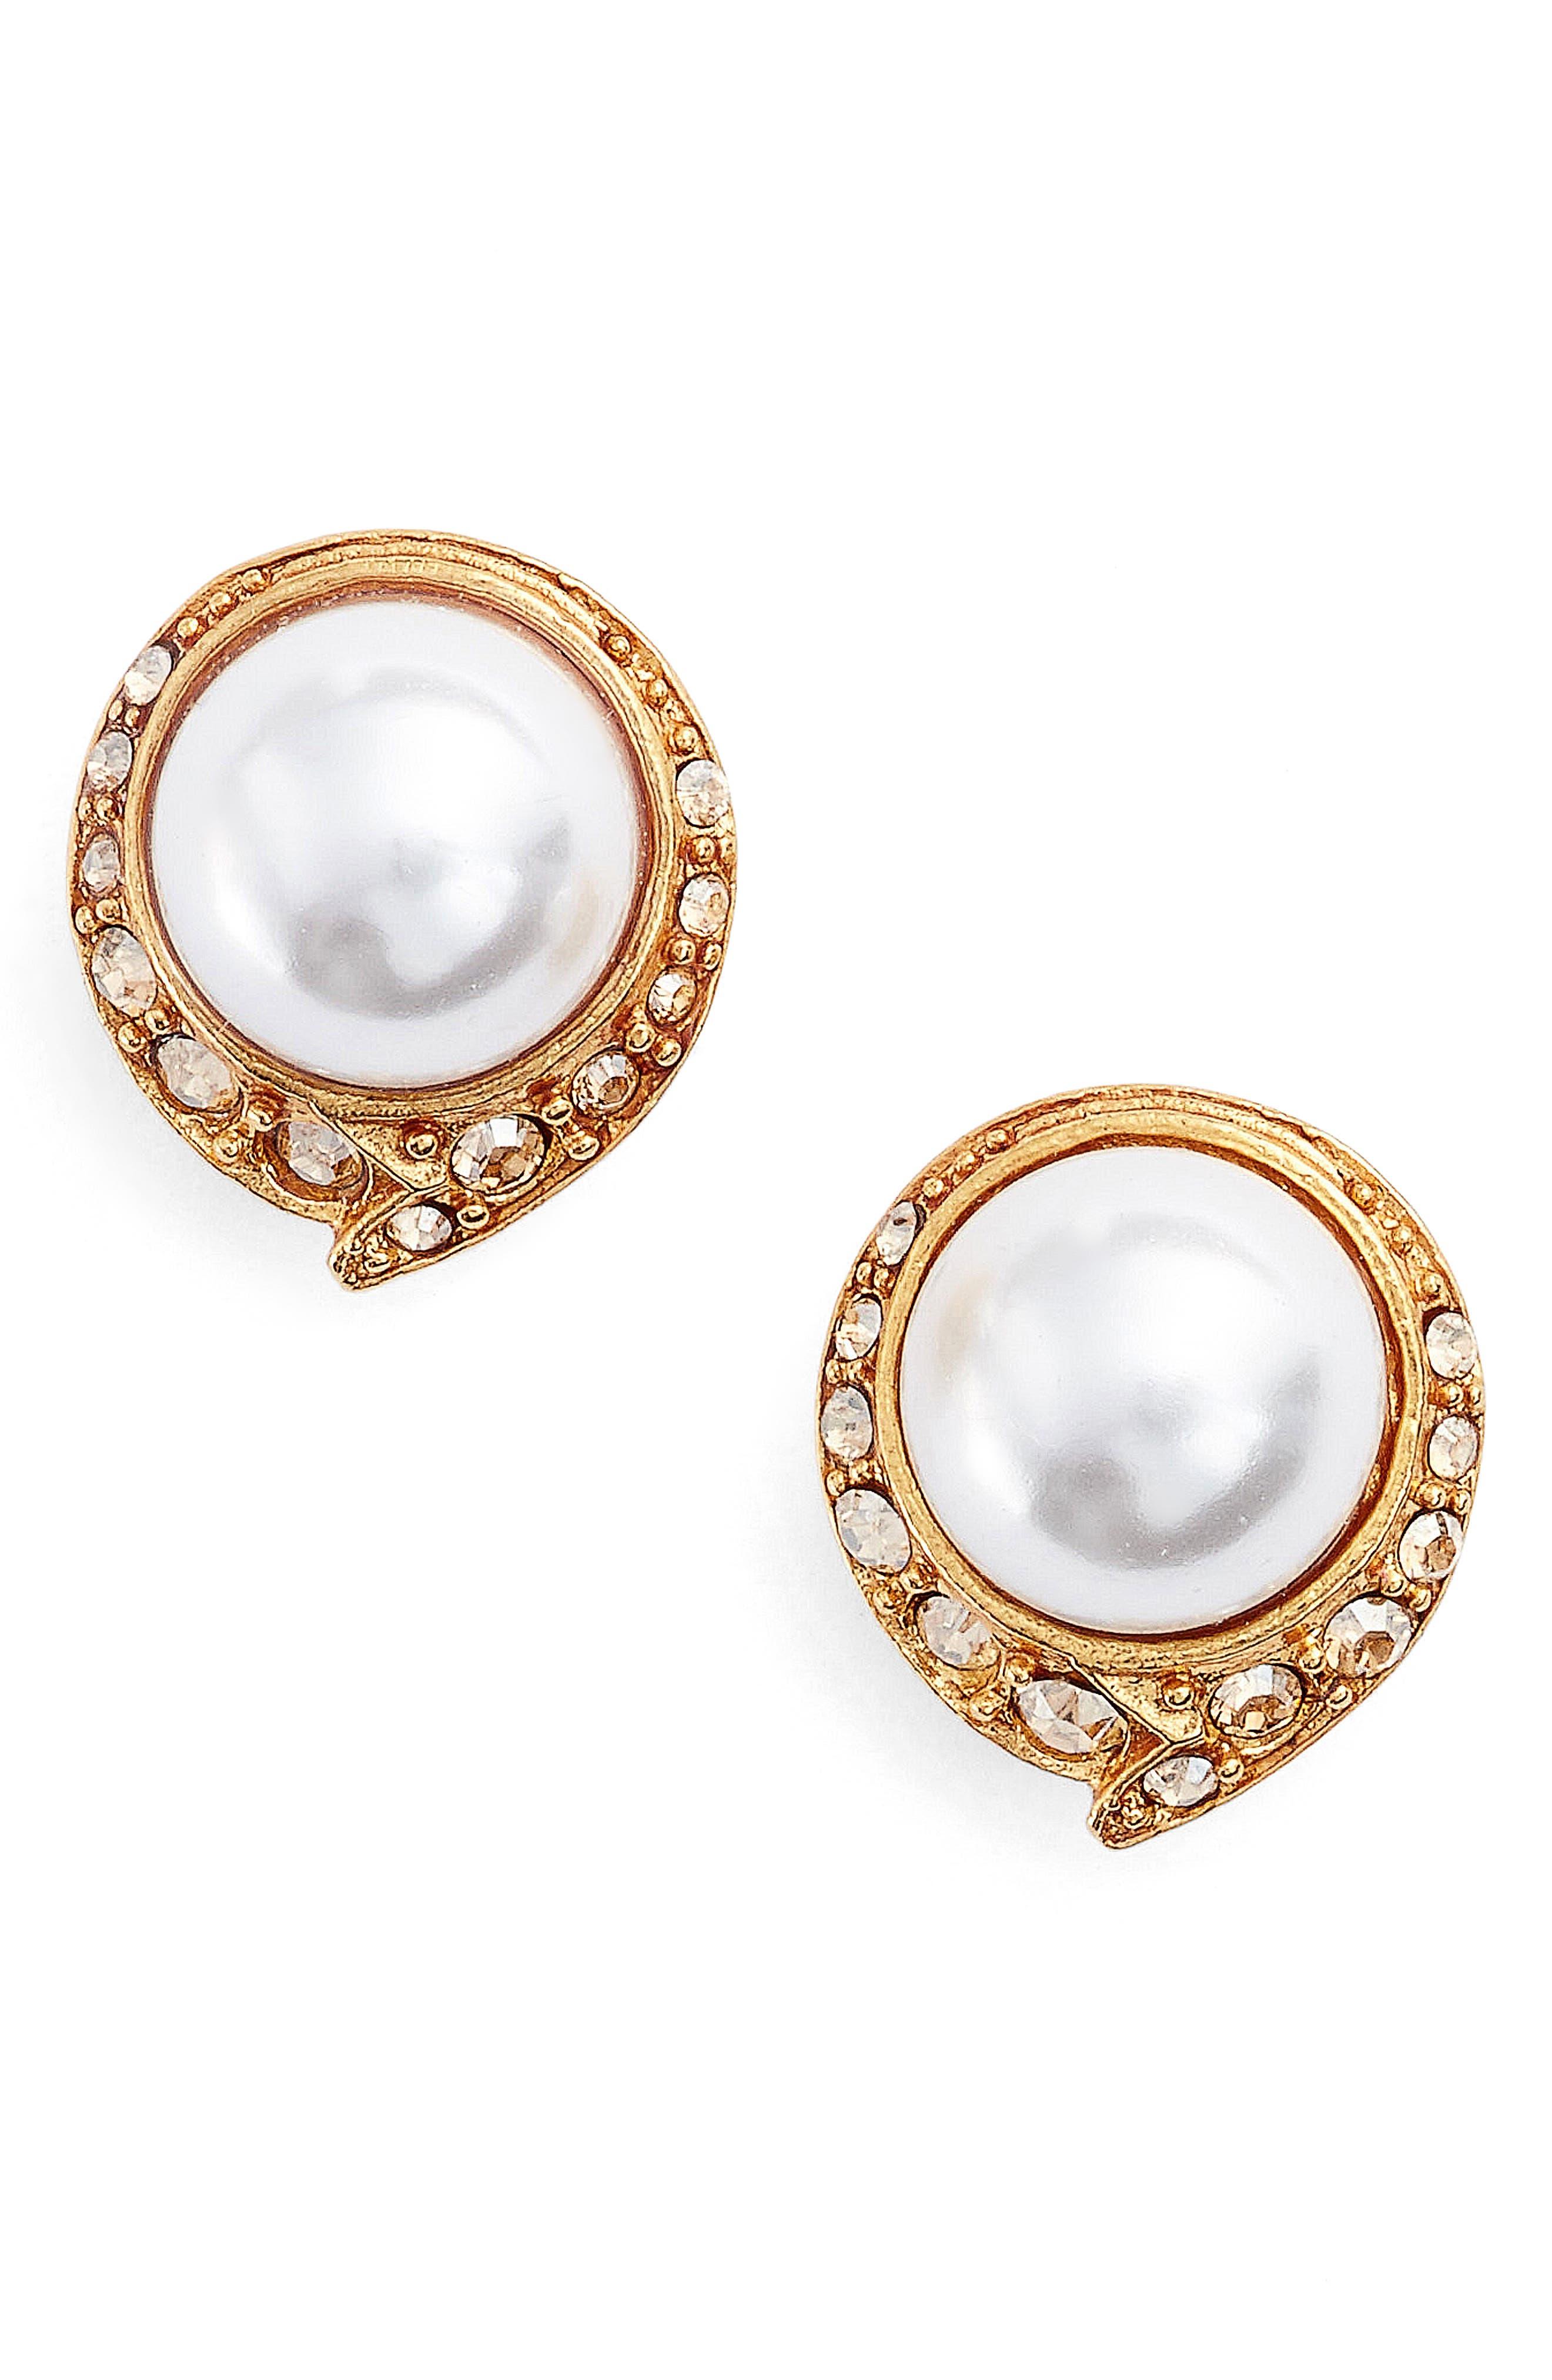 Main Image - Oscar de la Renta Simulated Pearl Stud Earrings